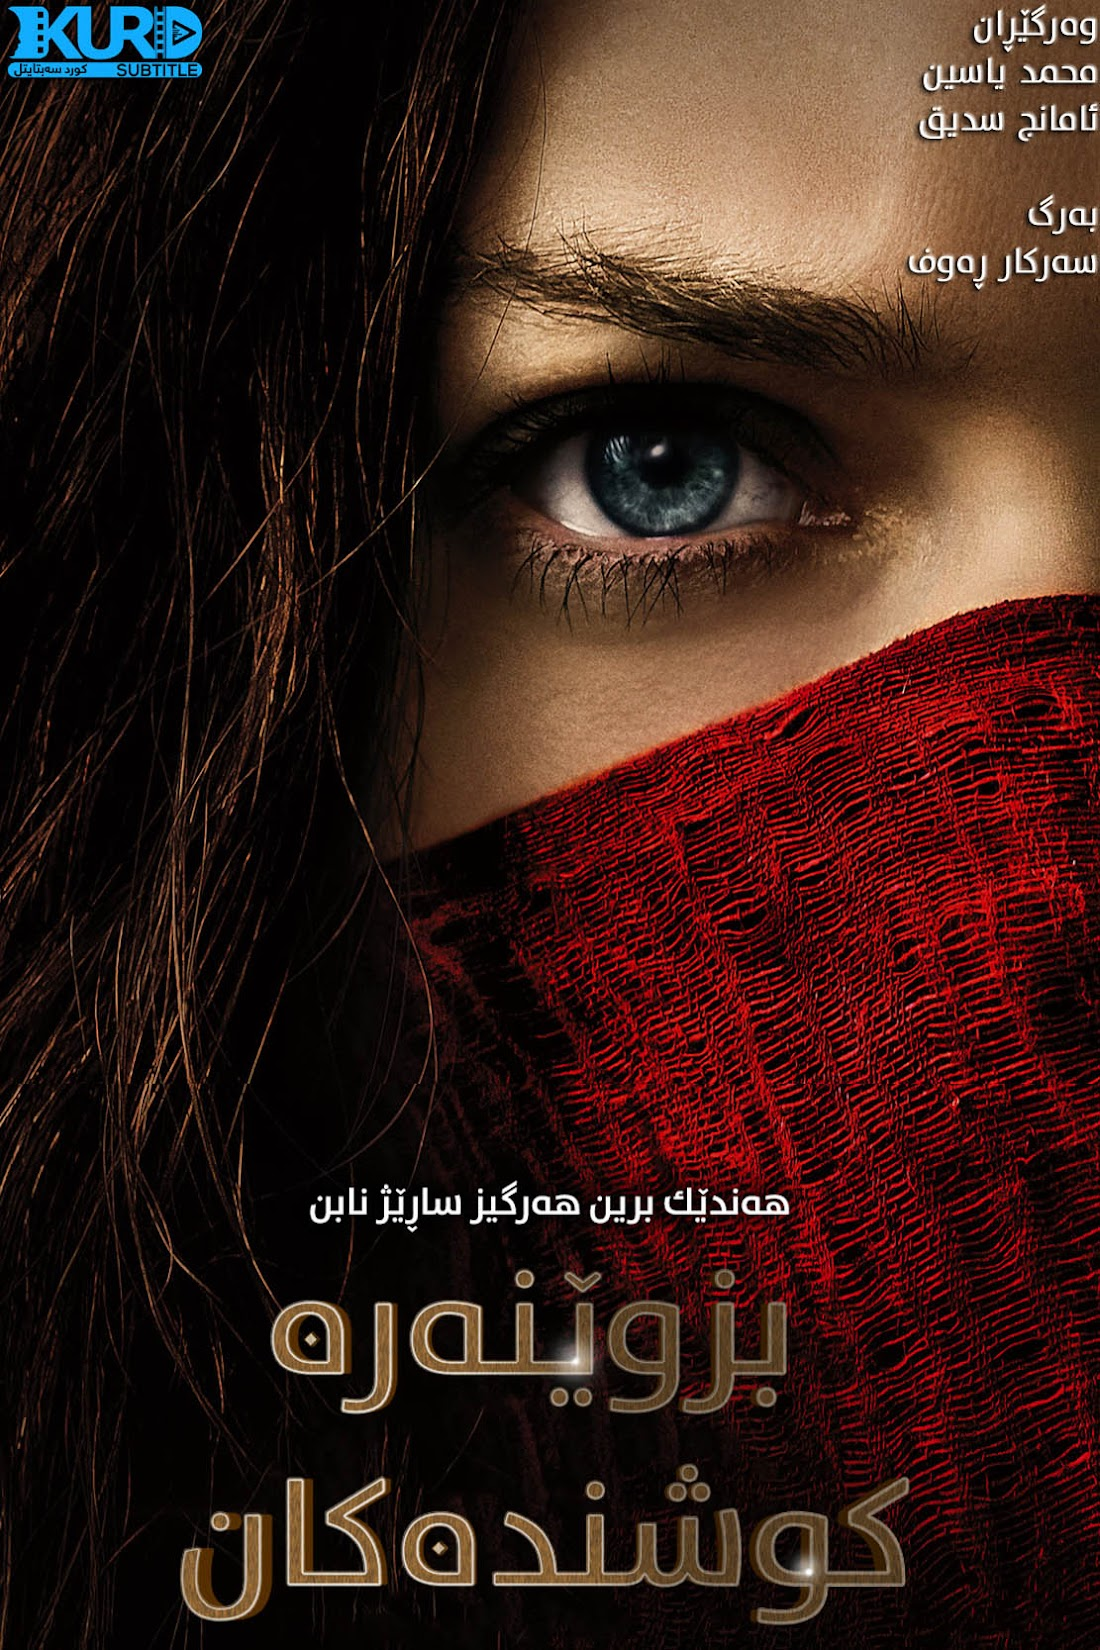 Mortal Engines kurdish poster